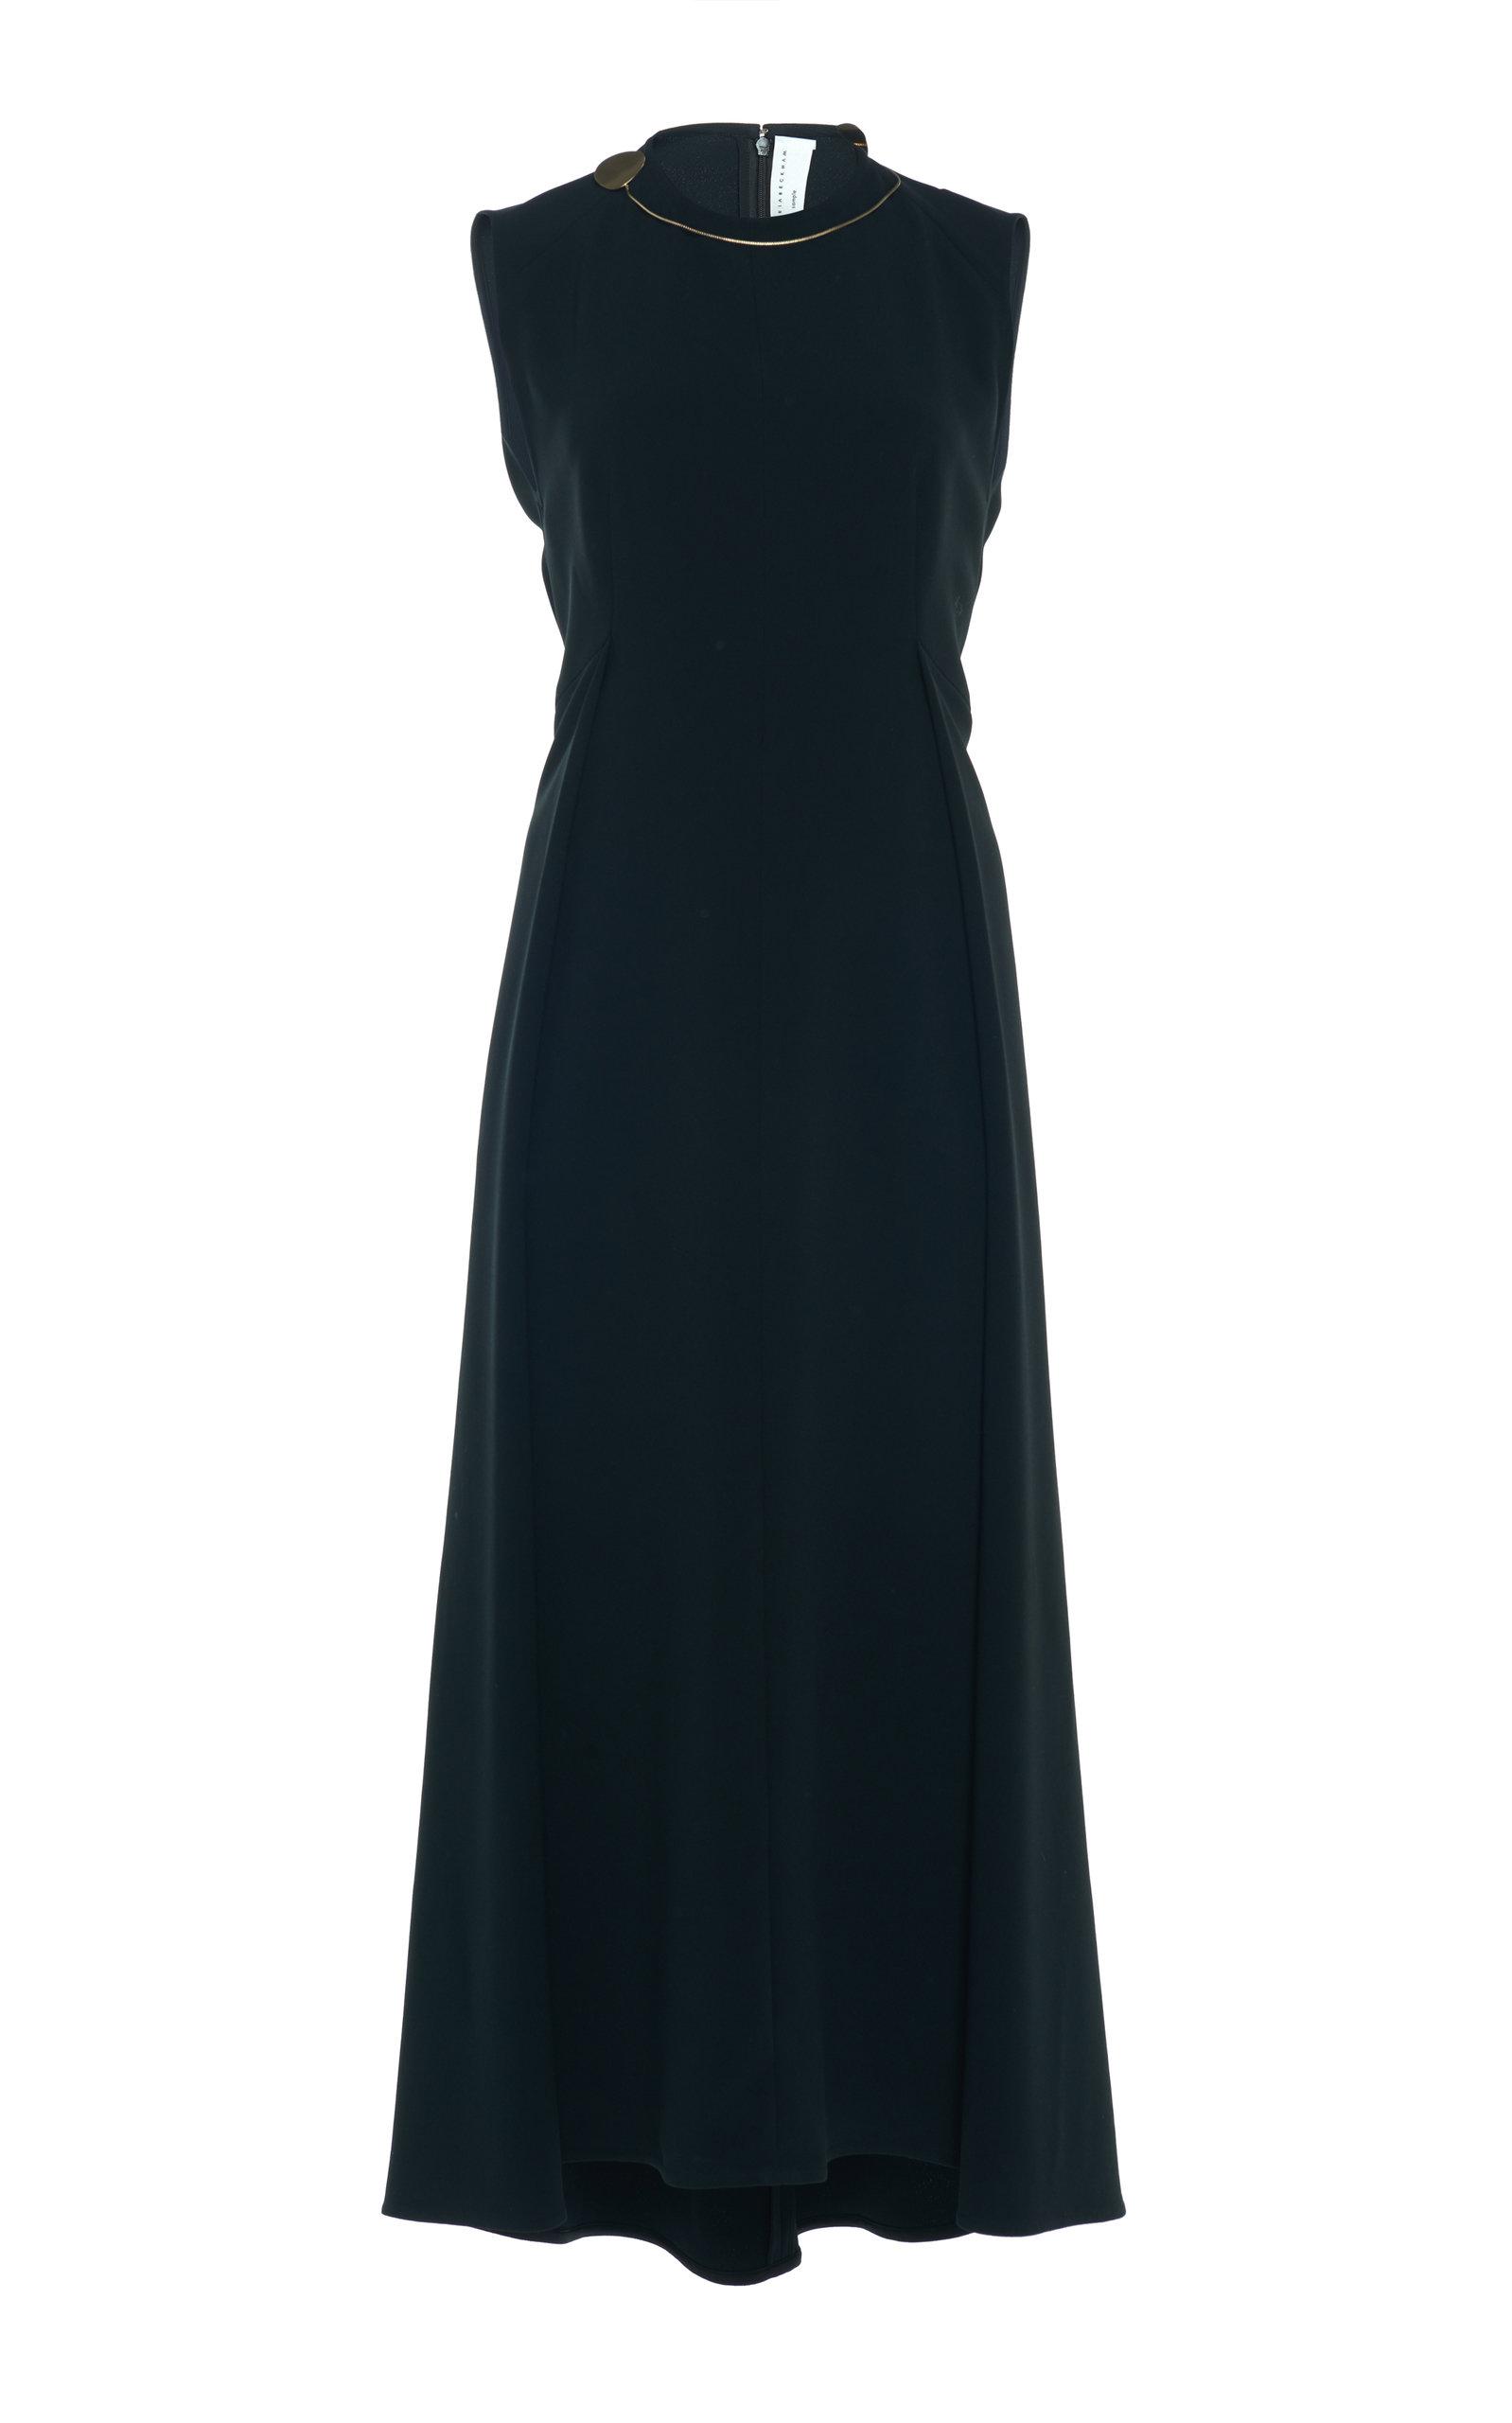 Buy Victoria Beckham A-Line Cady Midi Dress online, shop Victoria Beckham at the best price